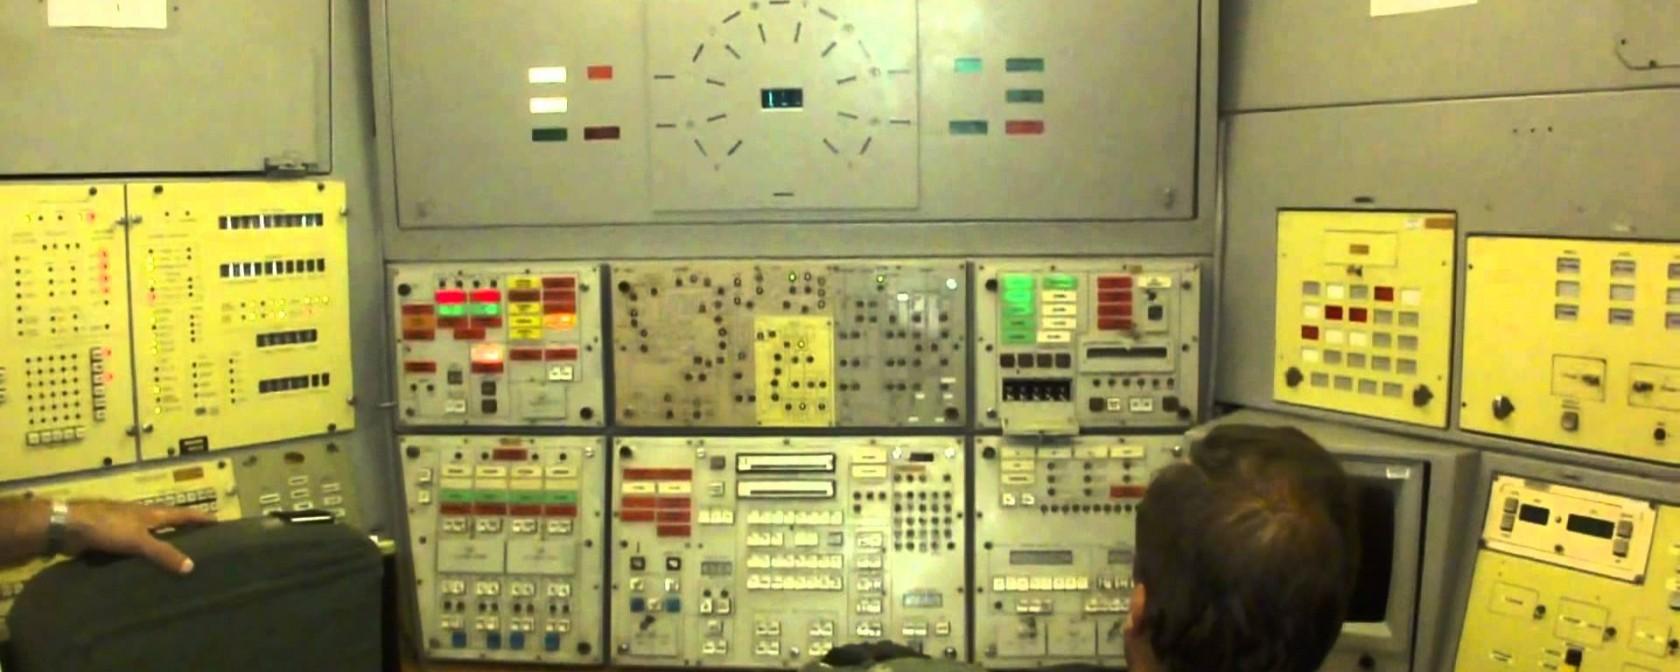 ядерная база